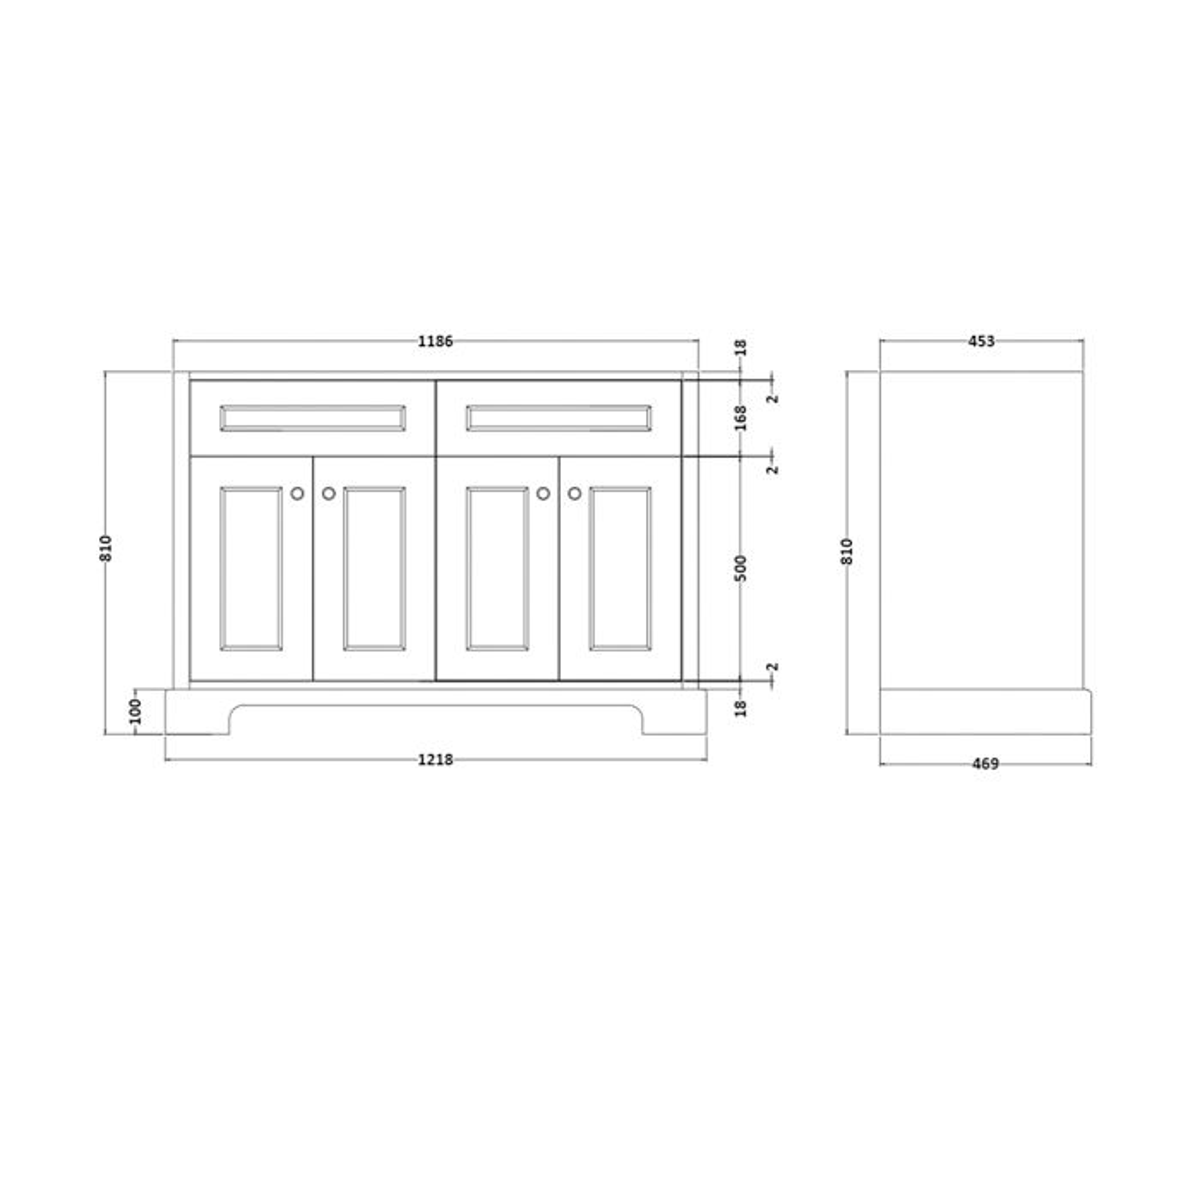 RAK Washington Black Vanity Unit with Grey Countertop 1200mm Measurements